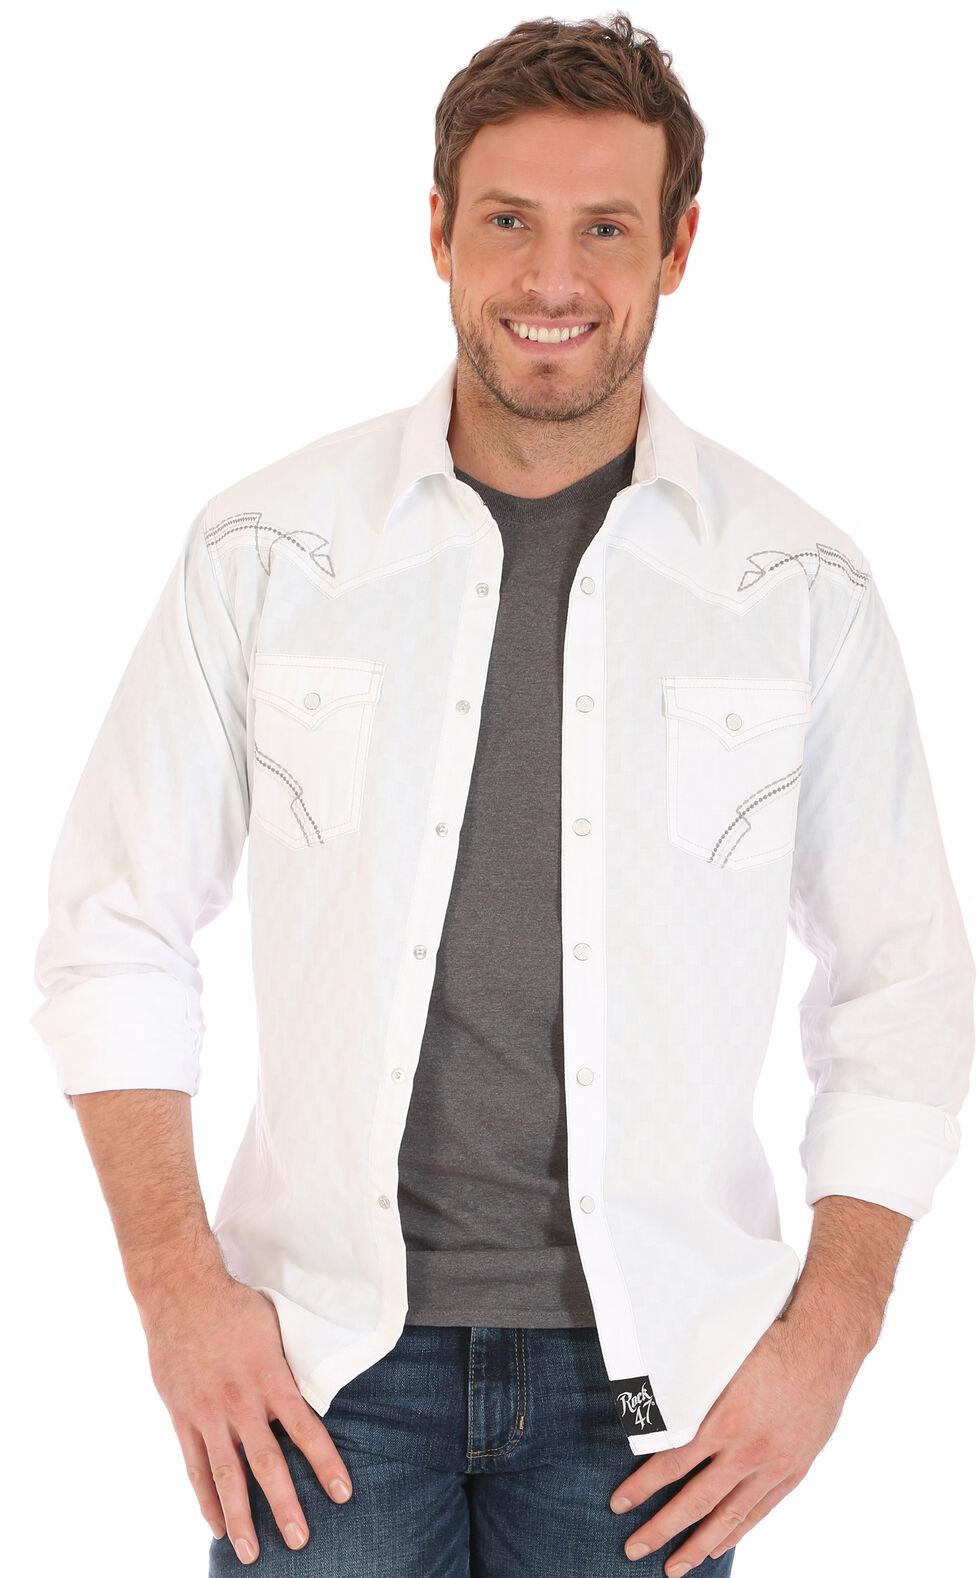 Wrangler Men's Rock 47 White Embroidered Stitch Long Sleeve Snap Shirt, White, hi-res